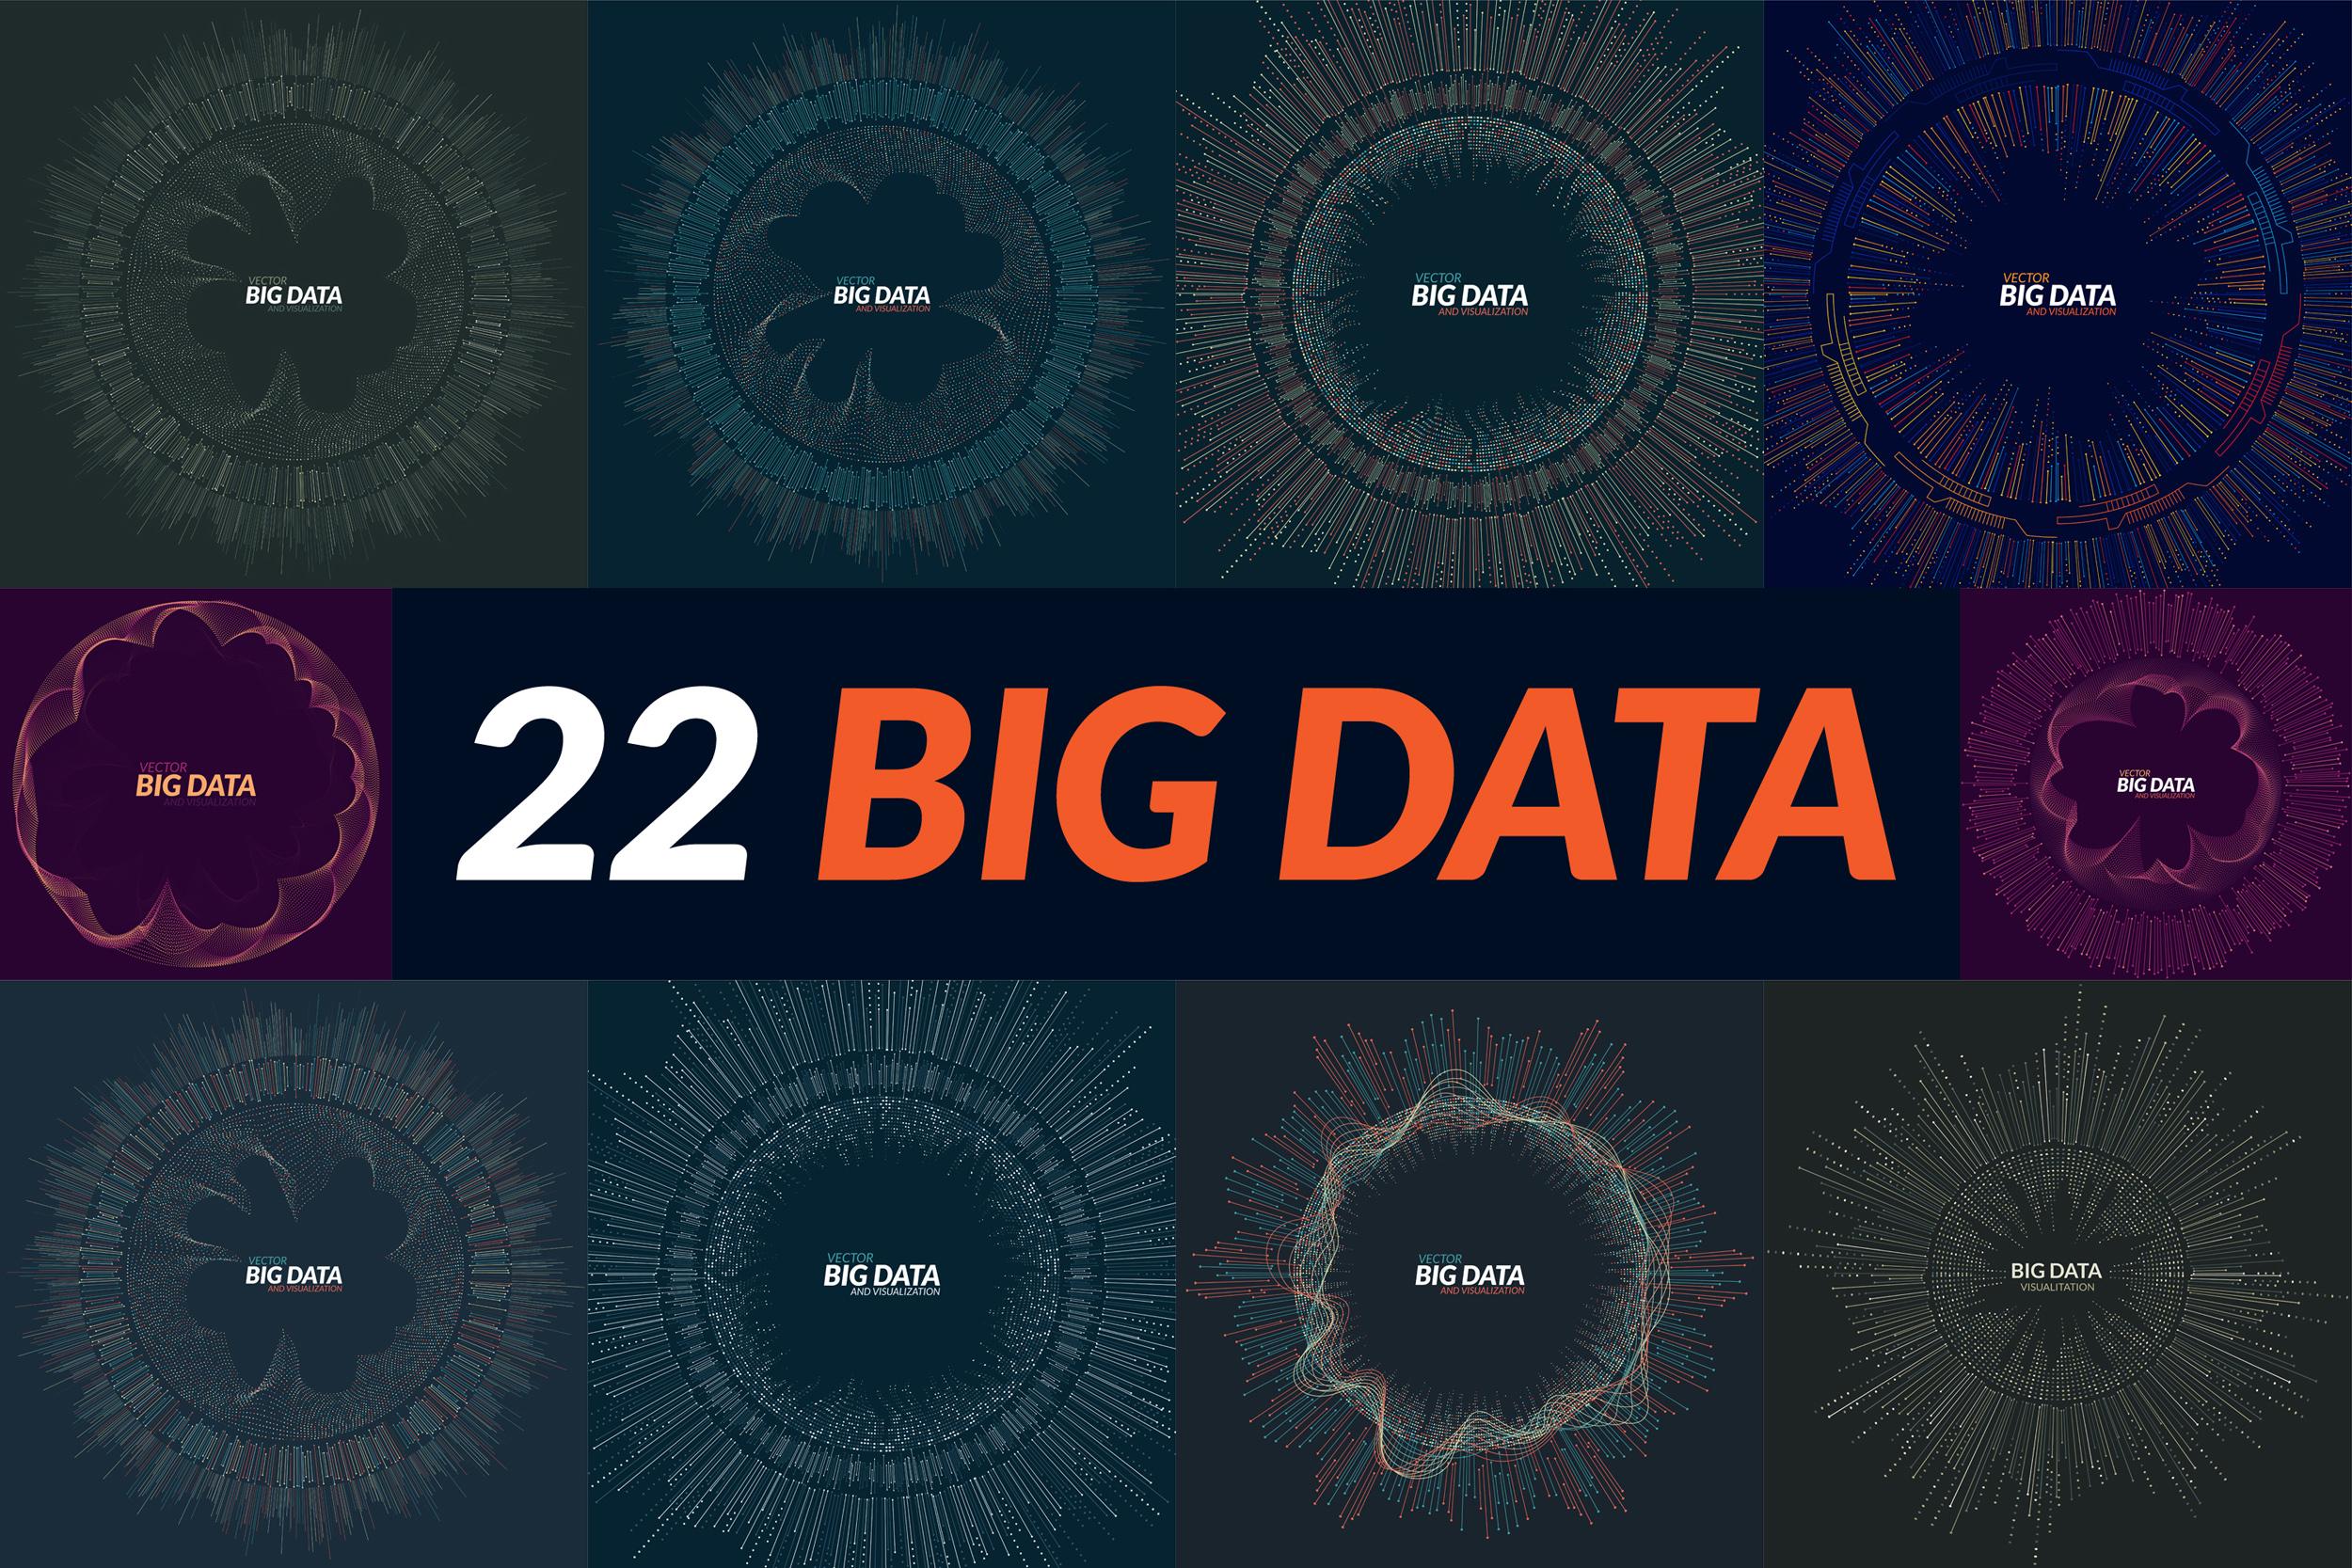 Big Data Backgrounds example image 3